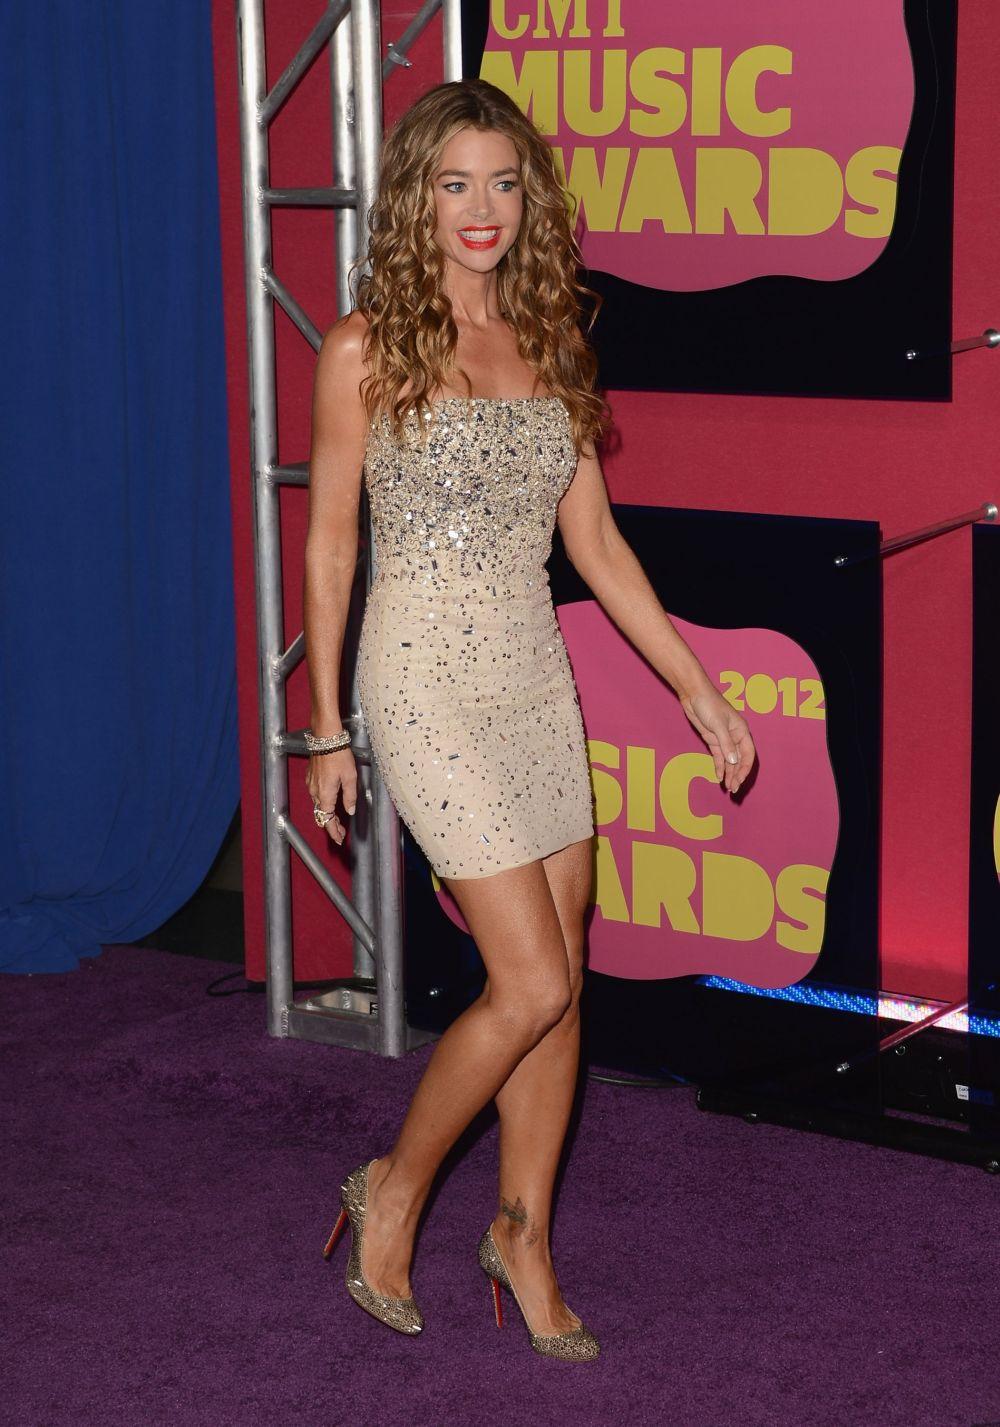 Denise Richards Legs  Only In High Heels